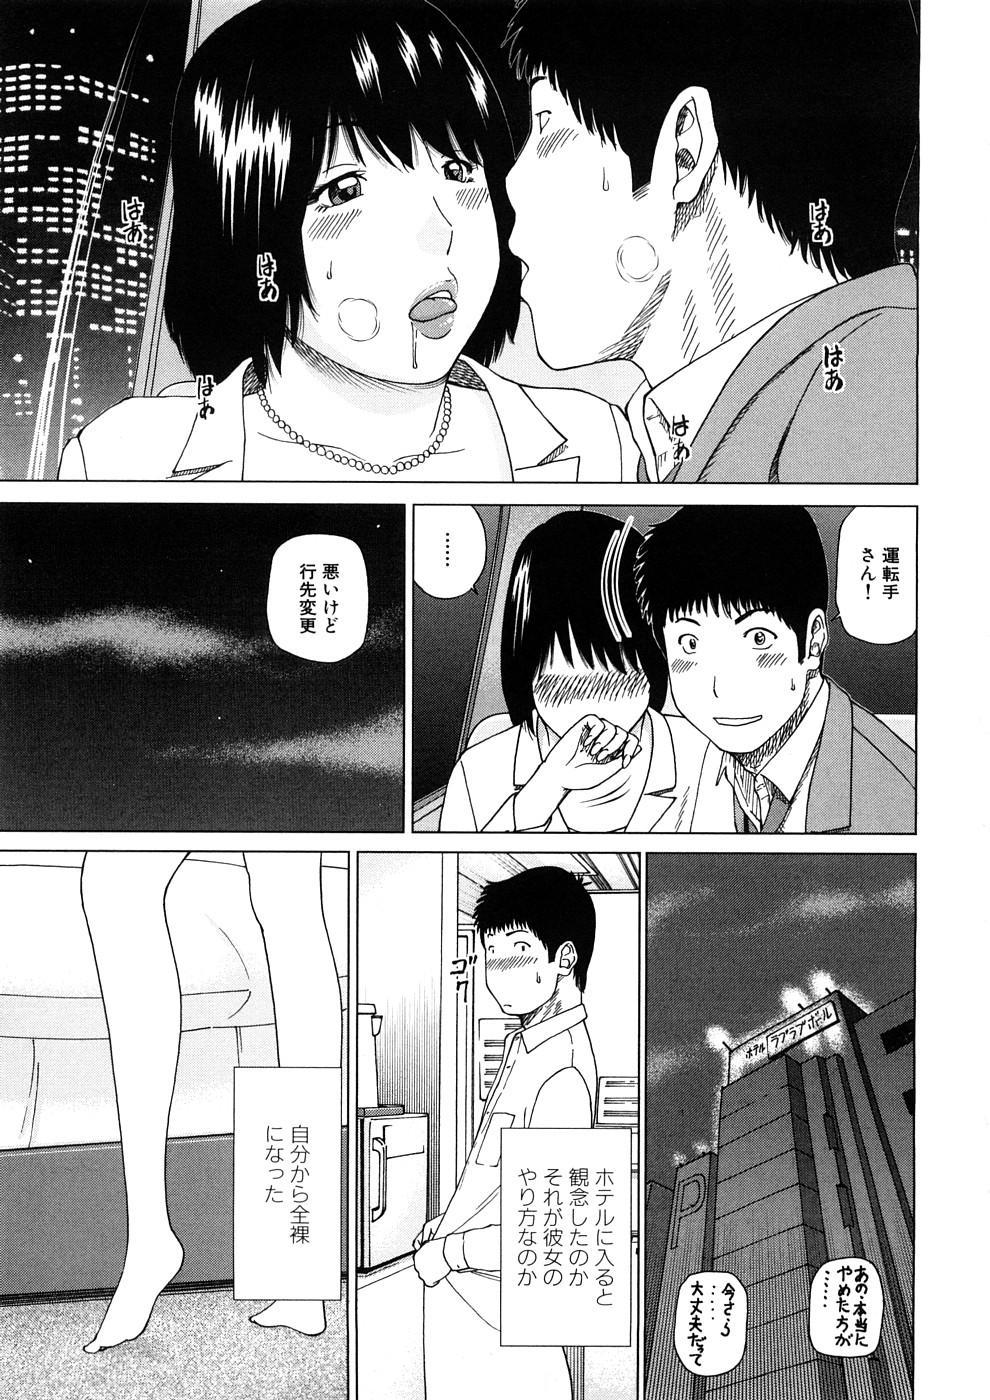 Geki Yaba Anthology Vol. 1 - Naka ni Dashite yo 55